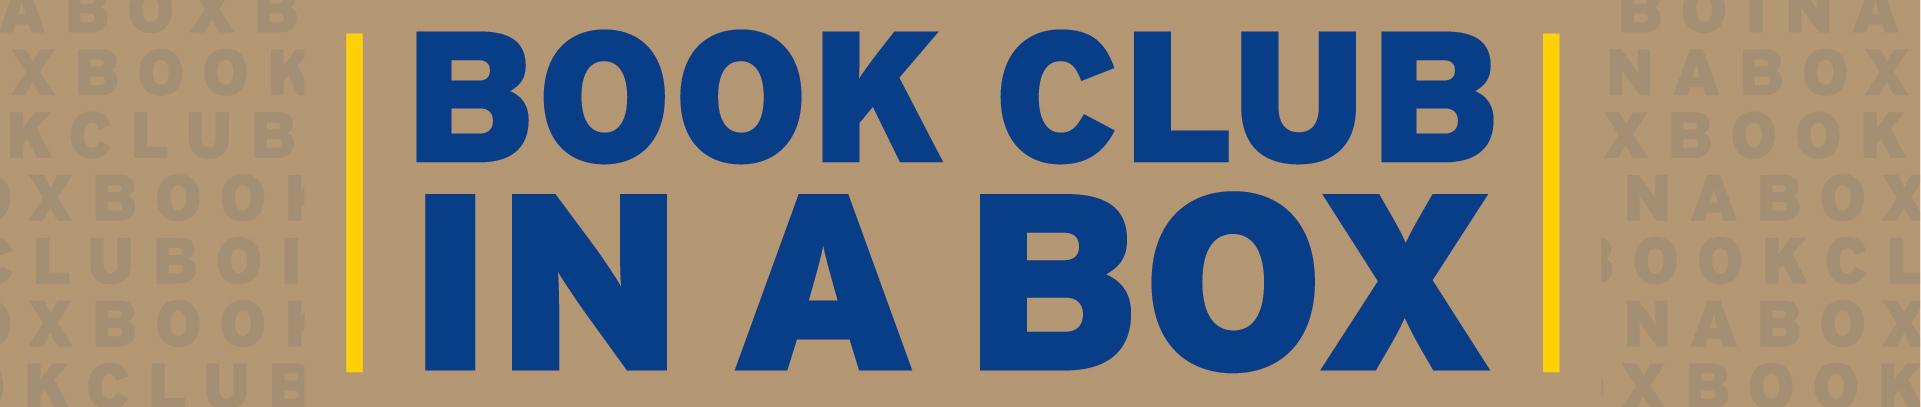 Book Club in a Box header image